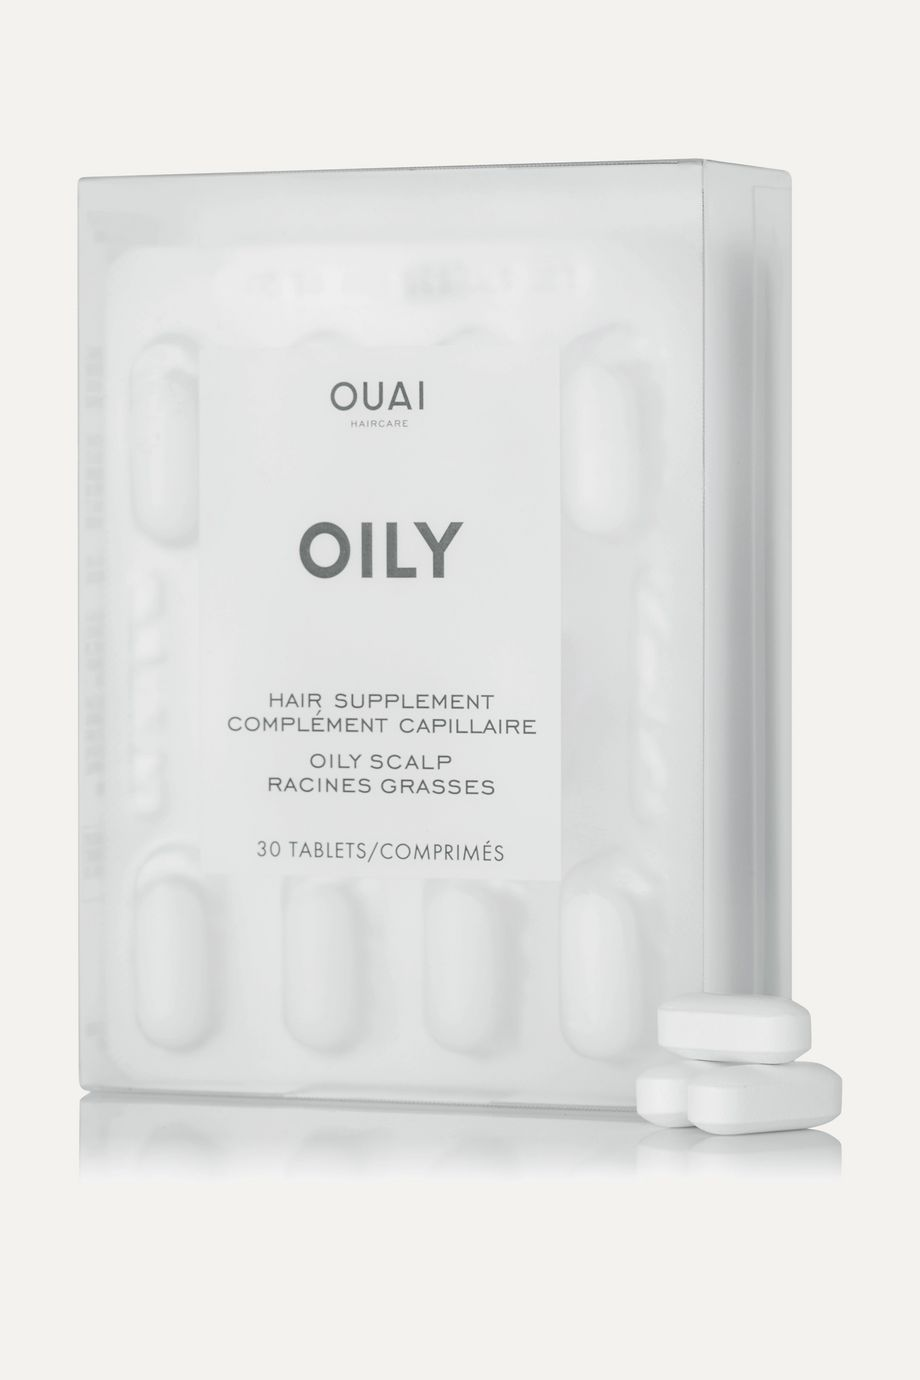 OUAI Haircare Oily Scalp Supplement (30 capsules)